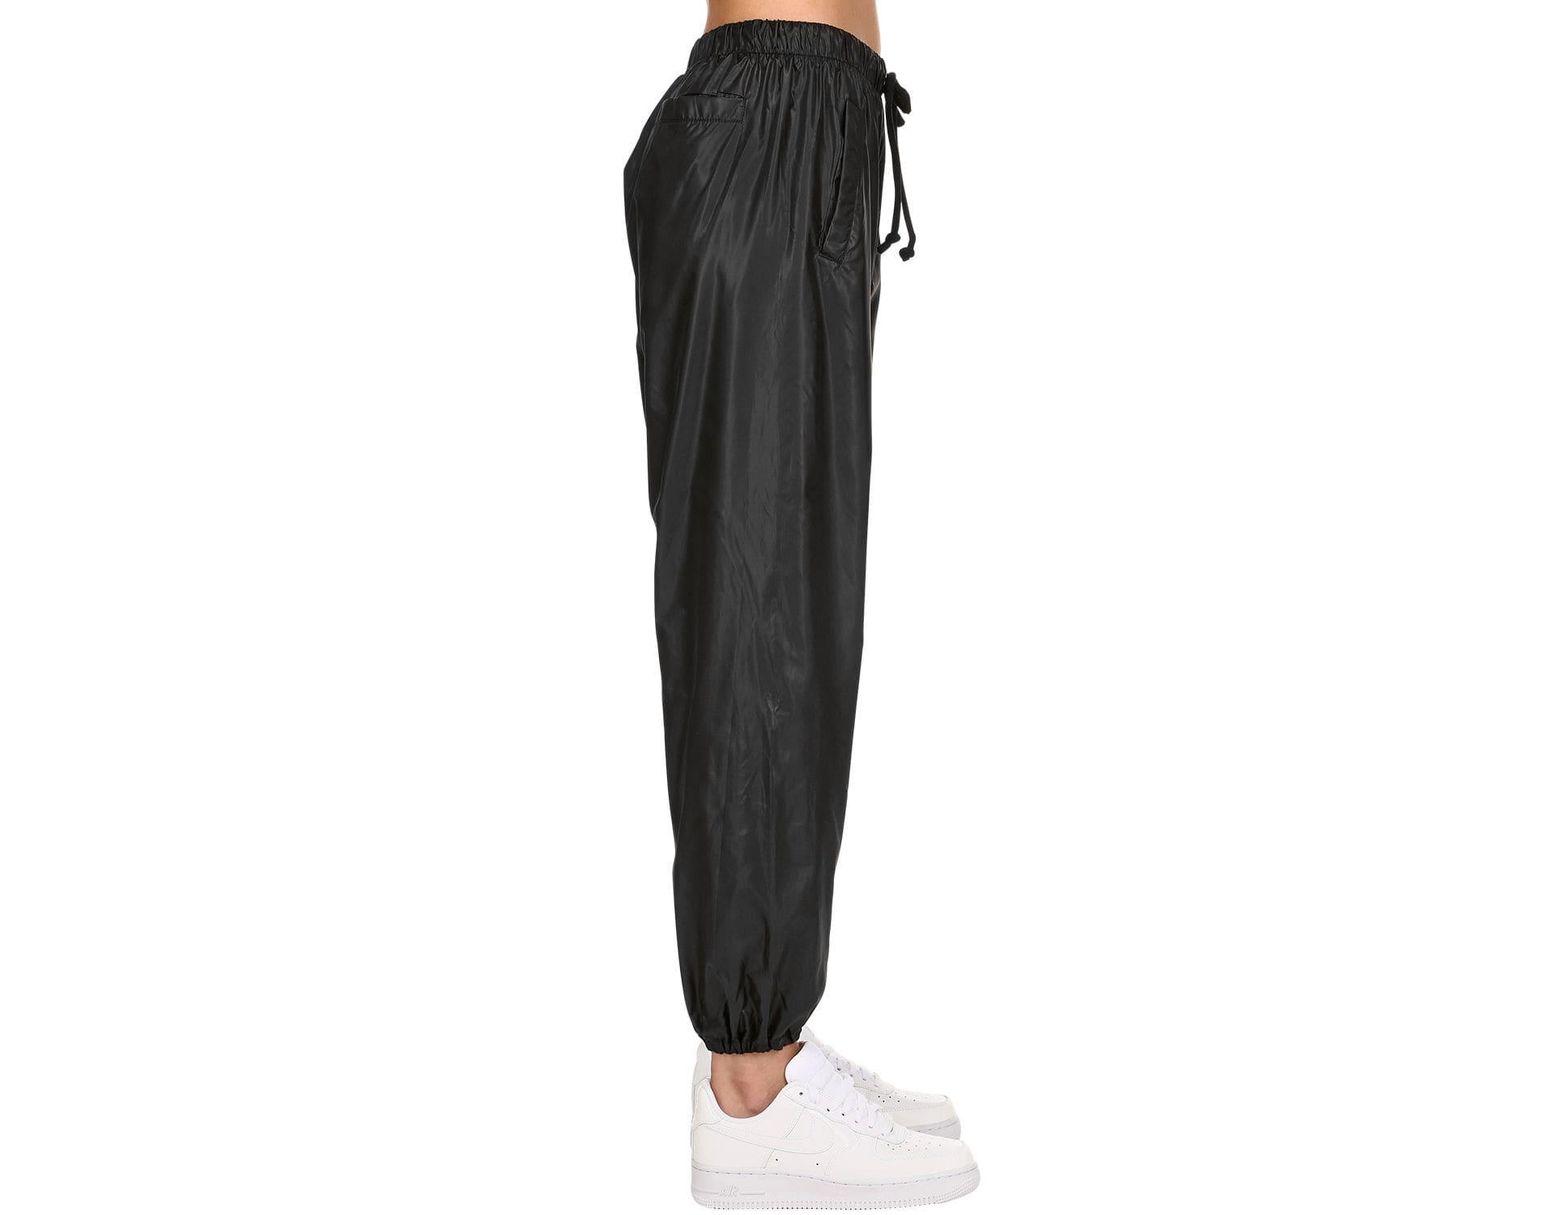 a031cbaf Natasha Zinko Logo Detail Nylon Track Pants in Black - Lyst